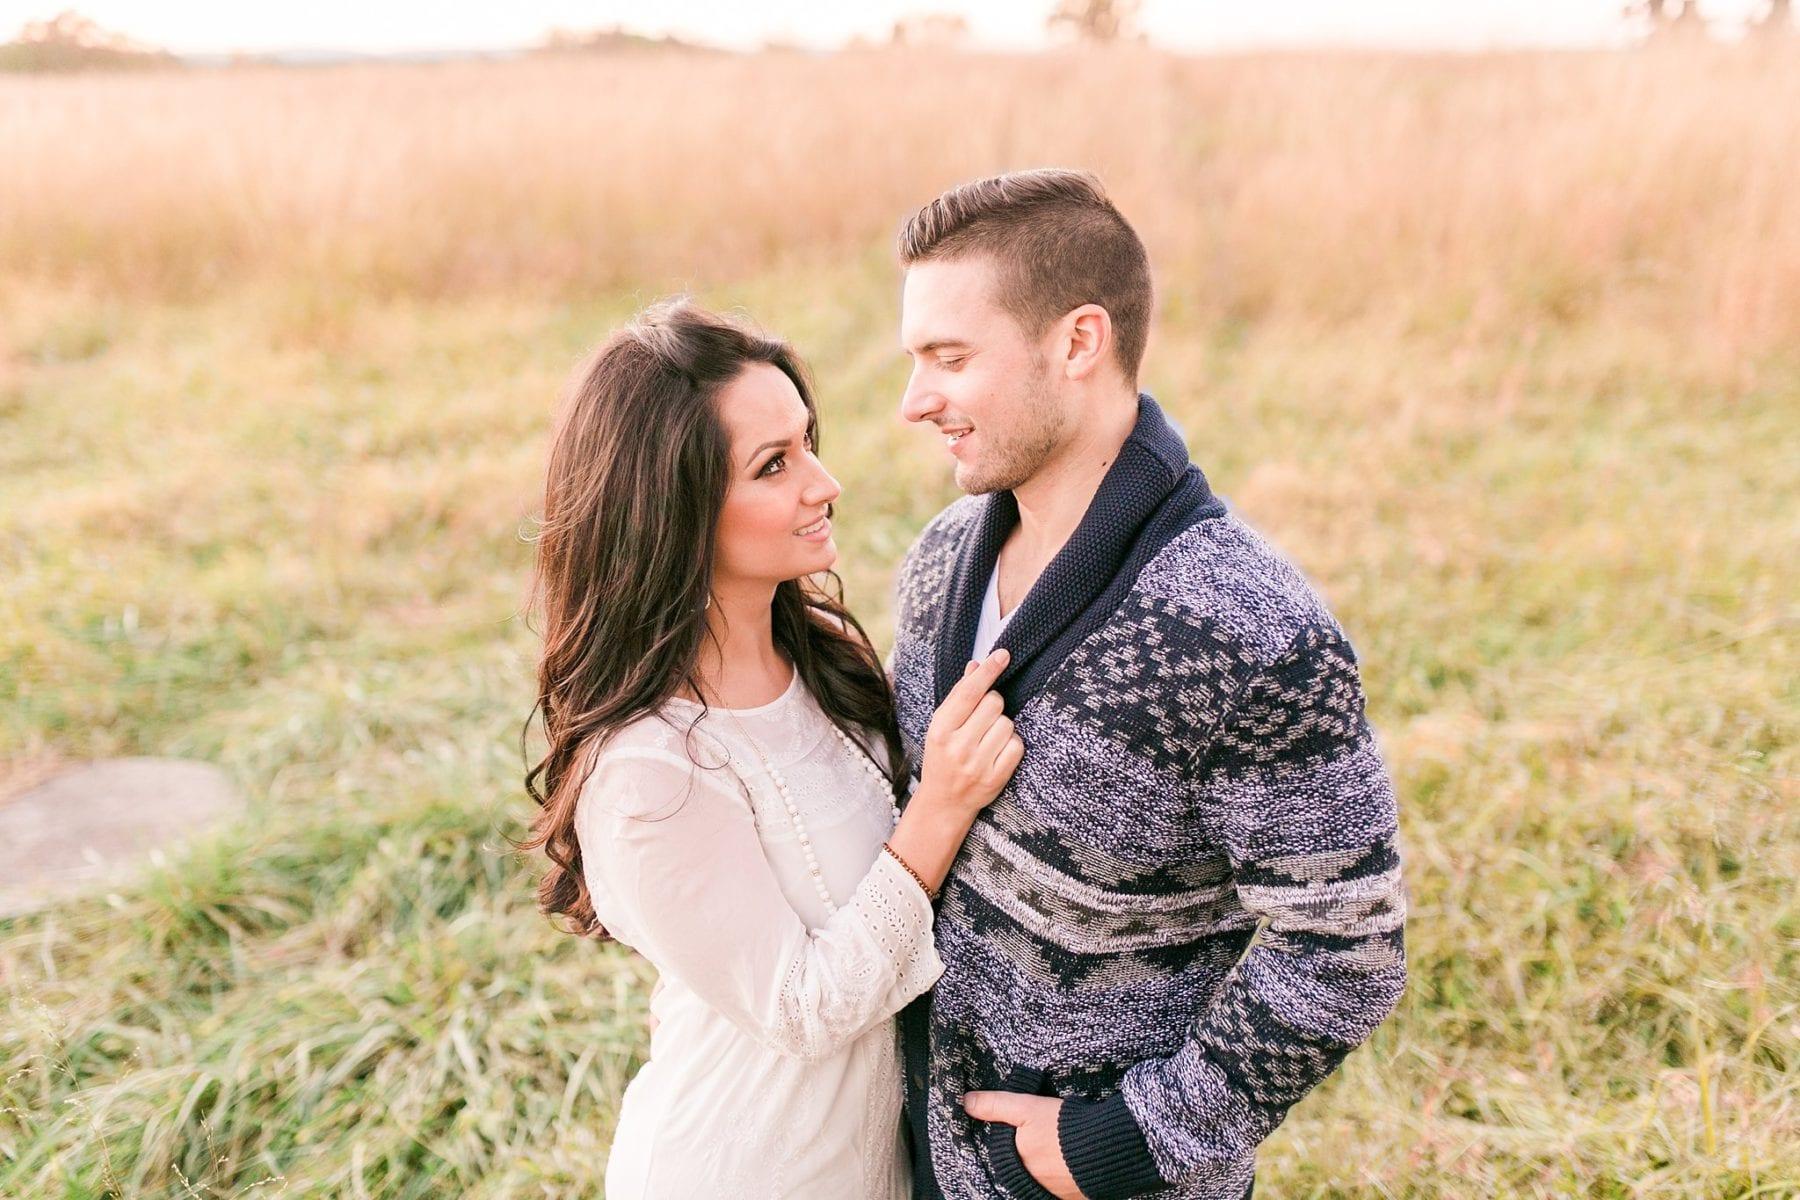 Manassas Battlefield Portraits Virginia Wedding Photographer Megan Kelsey Photography Lianne & Chris-294.jpg